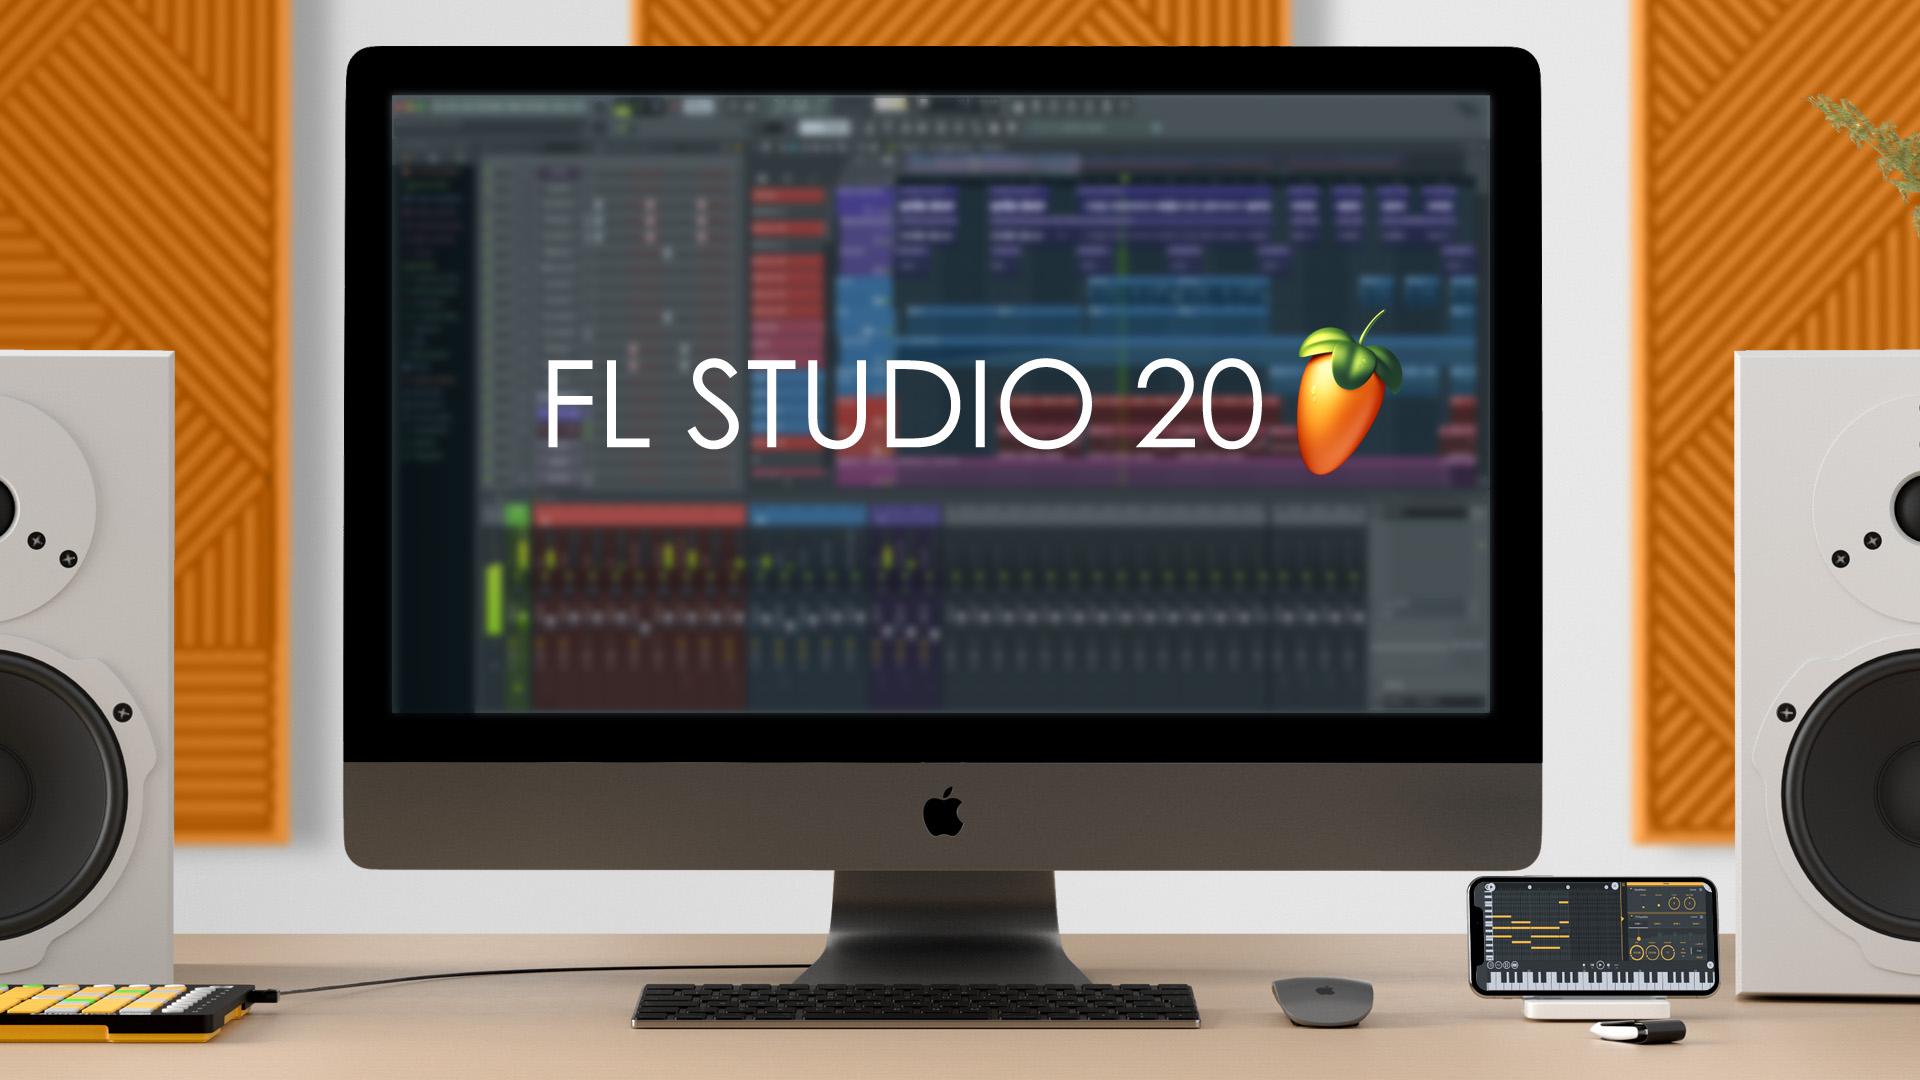 fl studio 12 crack reddit mac